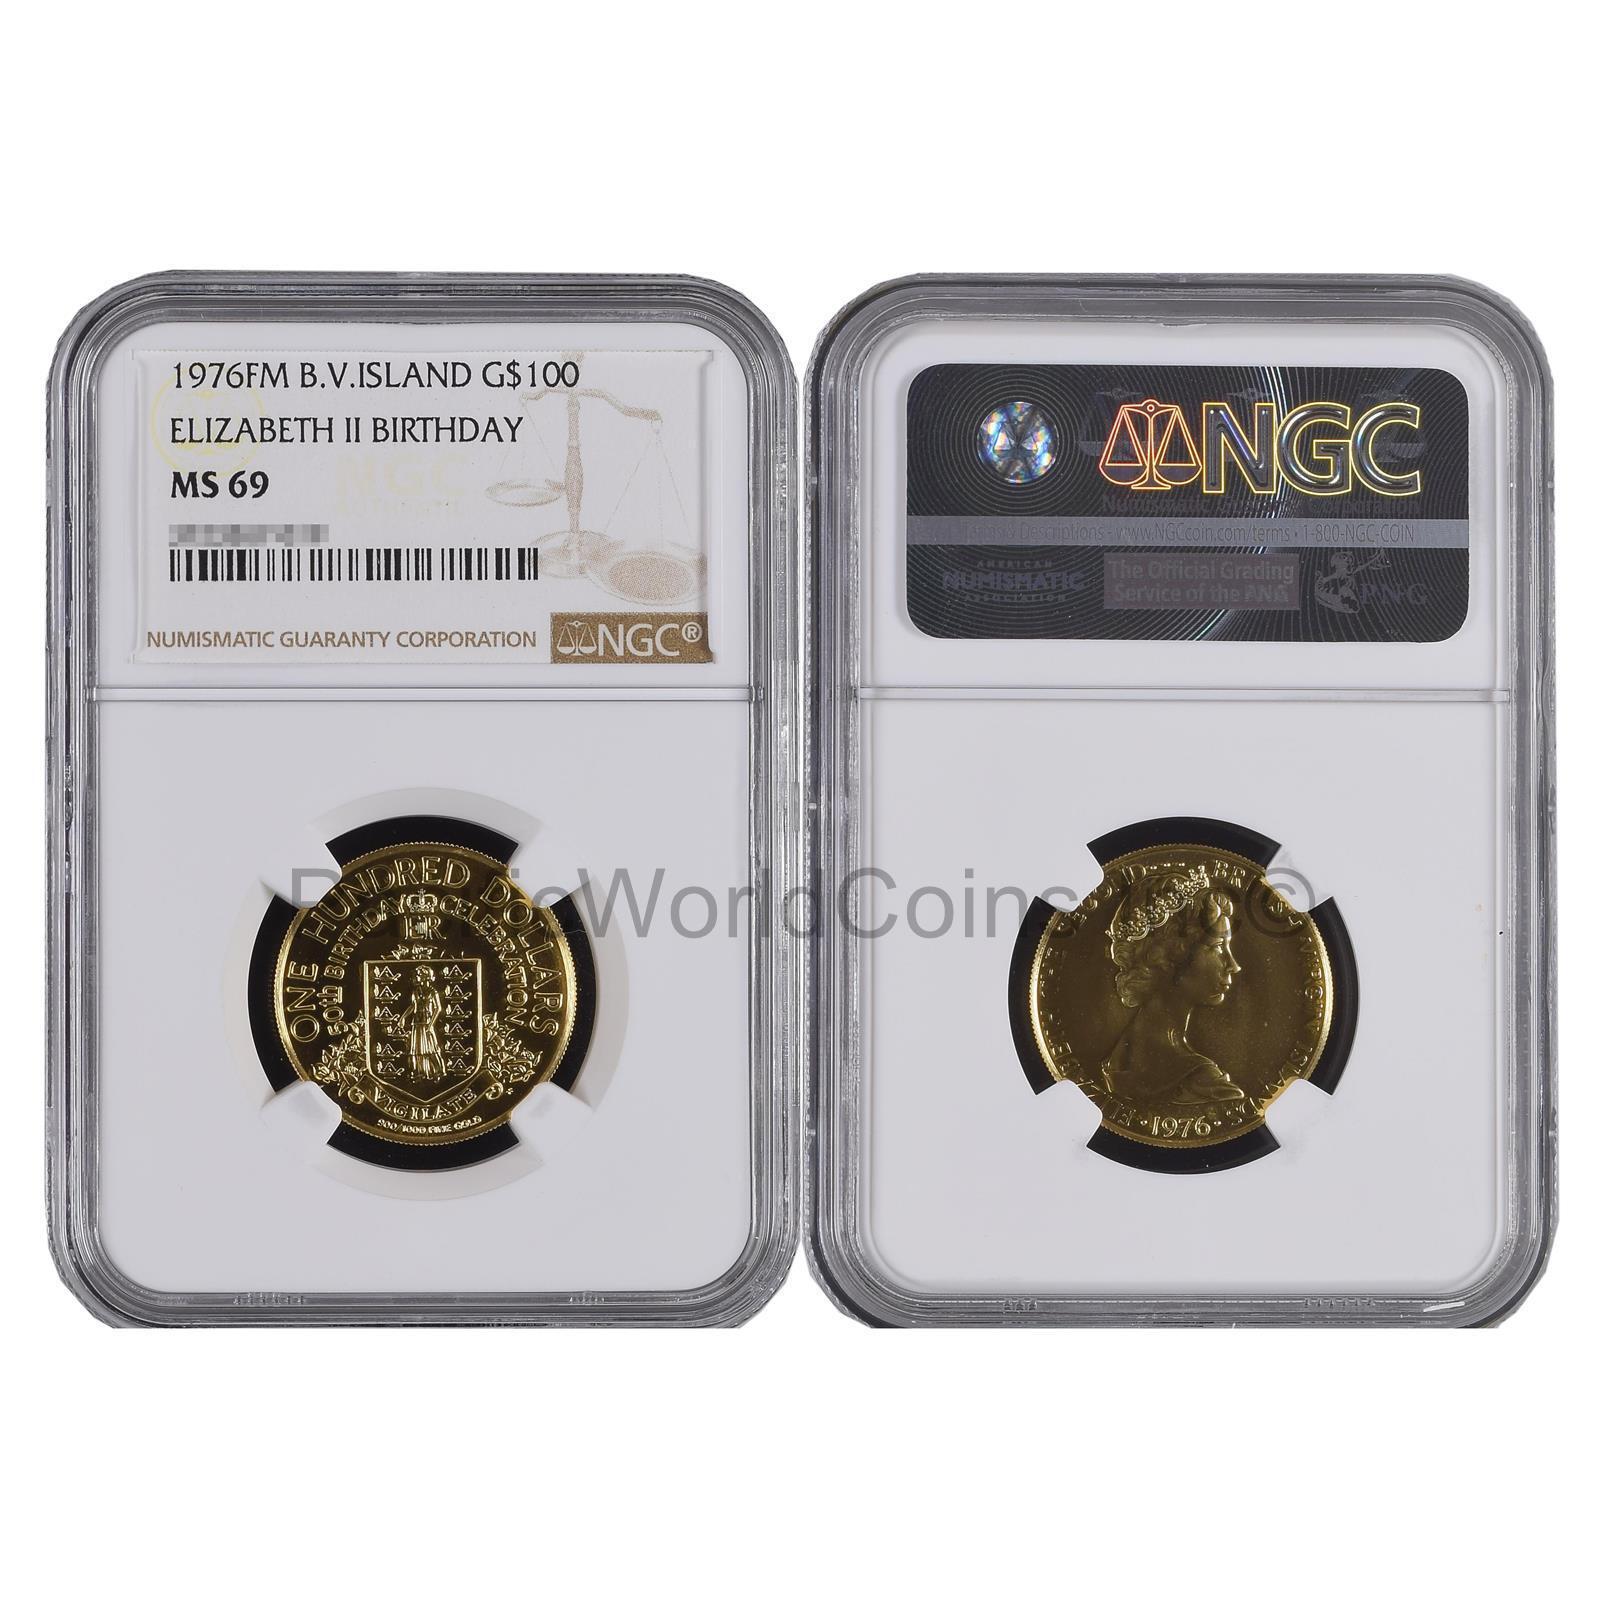 POISON DART FROG Frog Collection JFK Kennedy Half Dollar US Coin